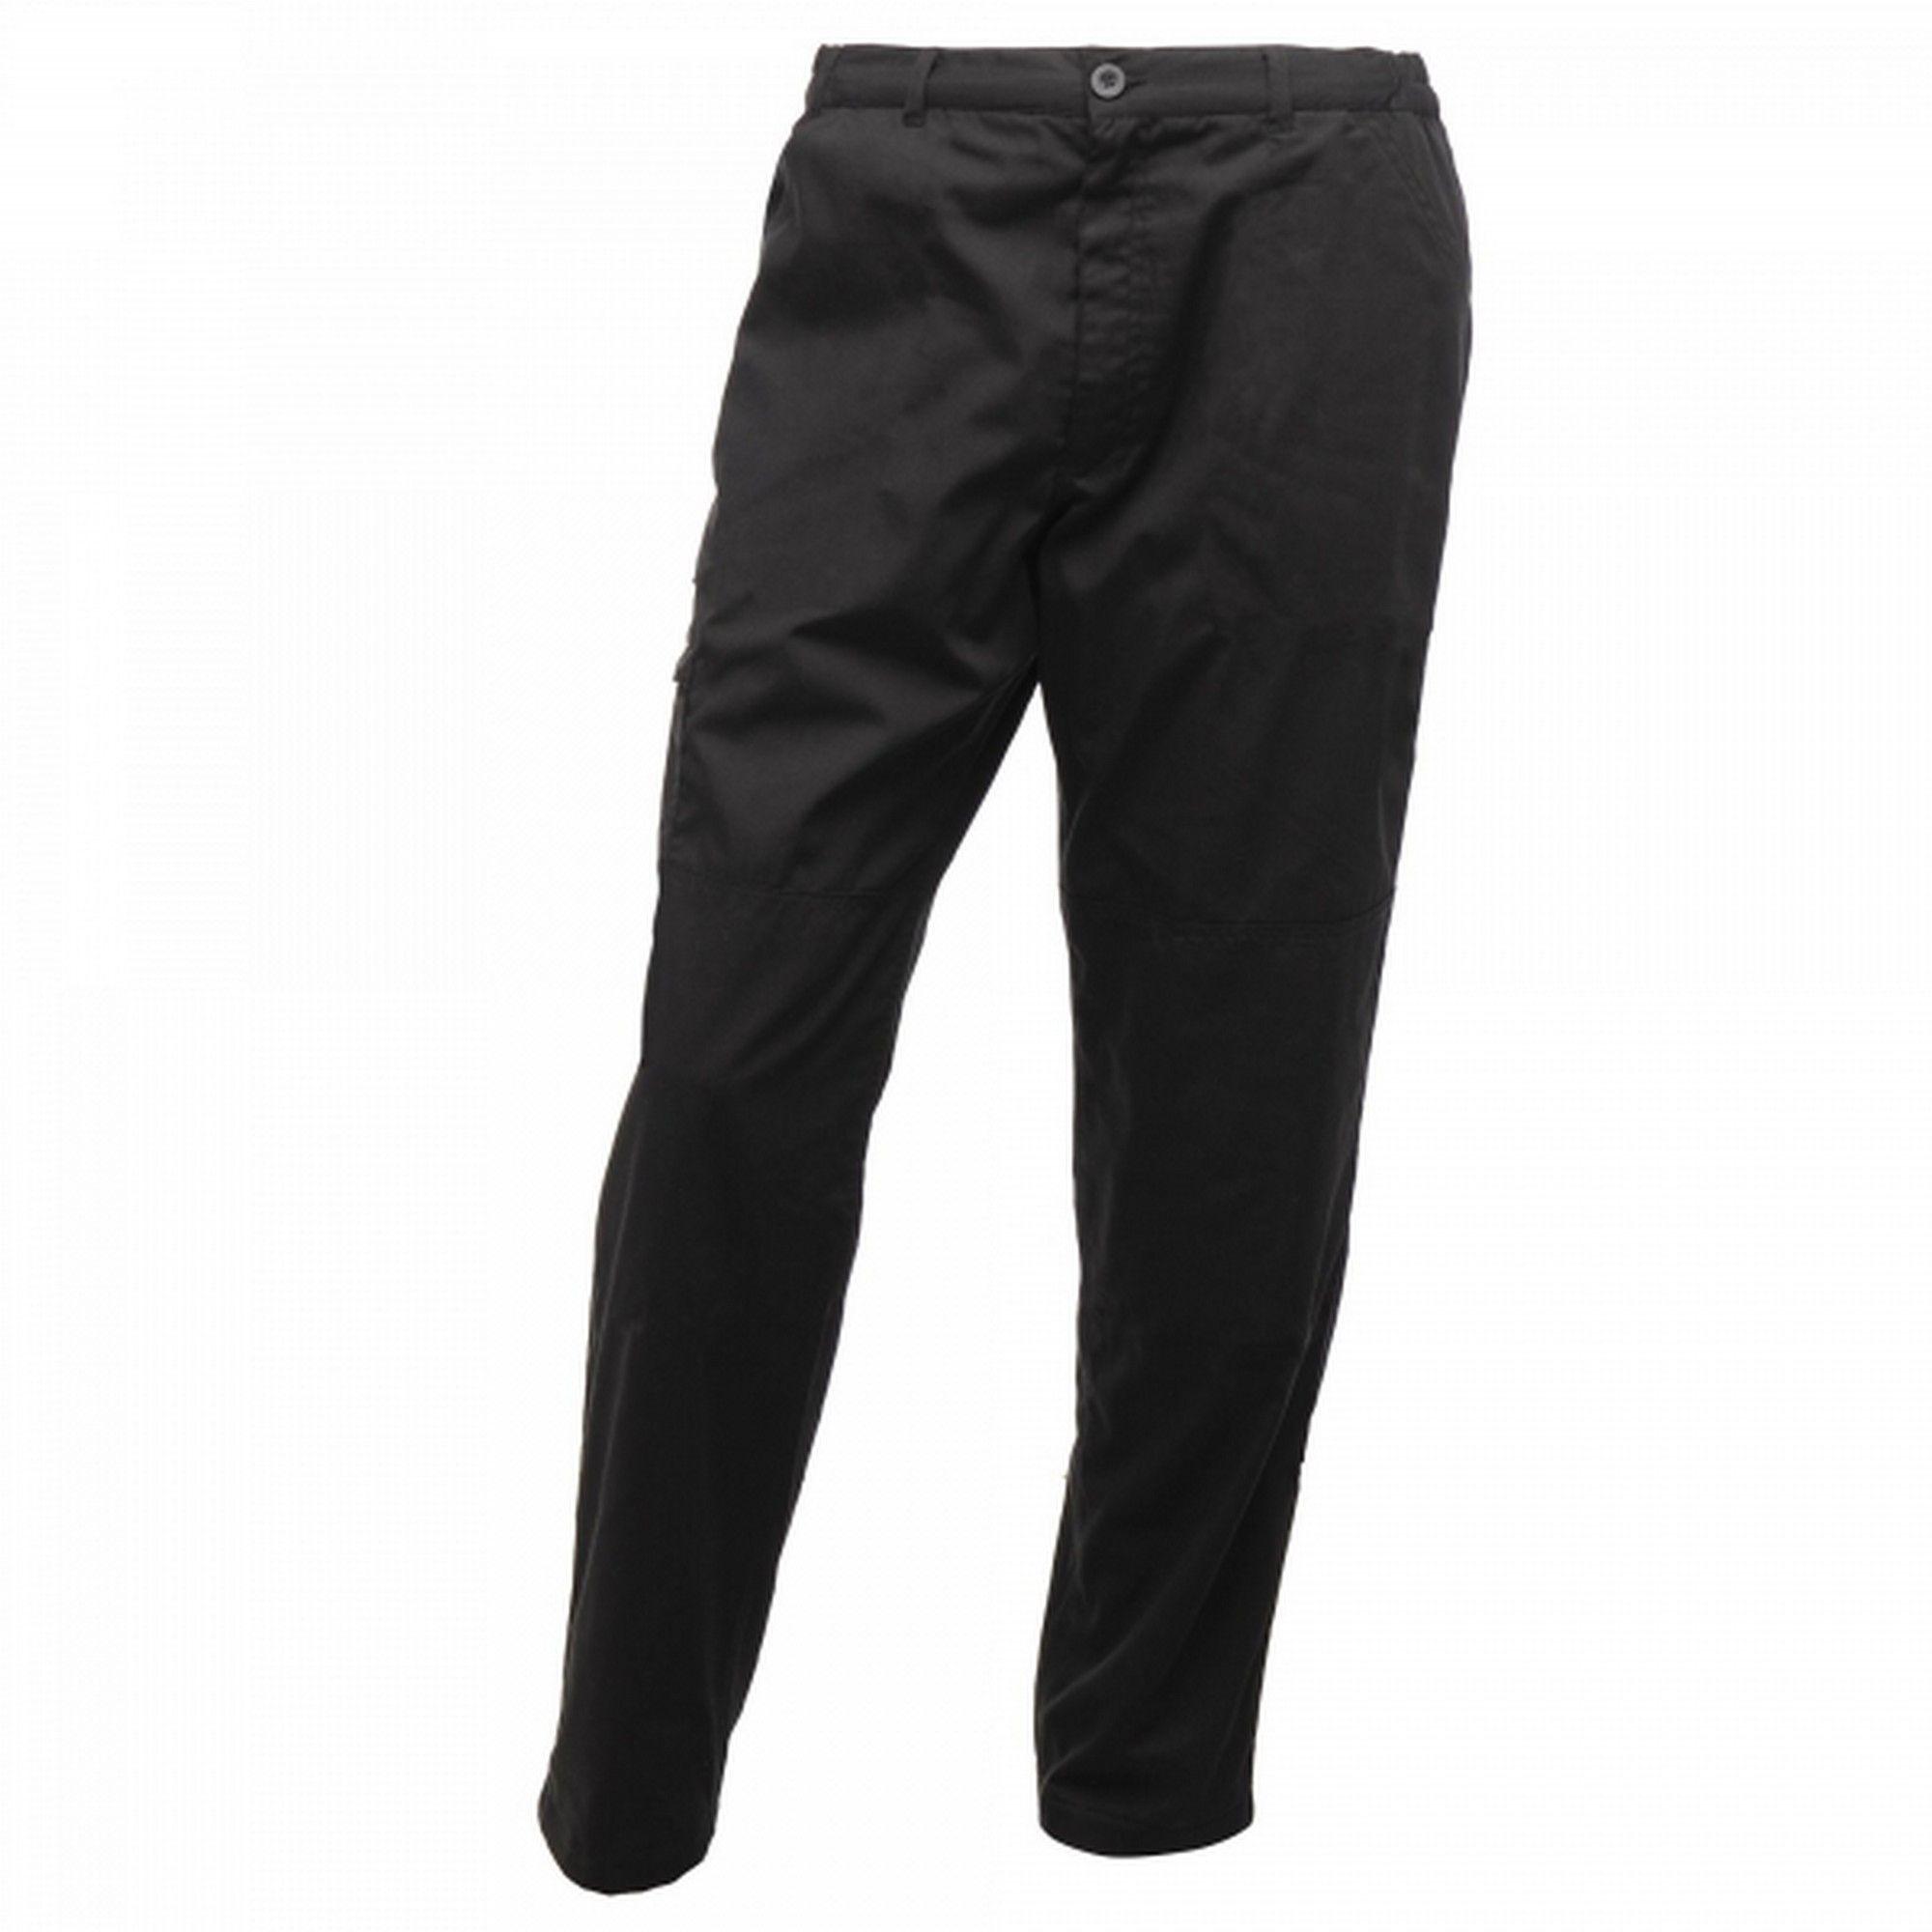 Regatta Mens Pro Cargo Waterproof Trousers - Regular